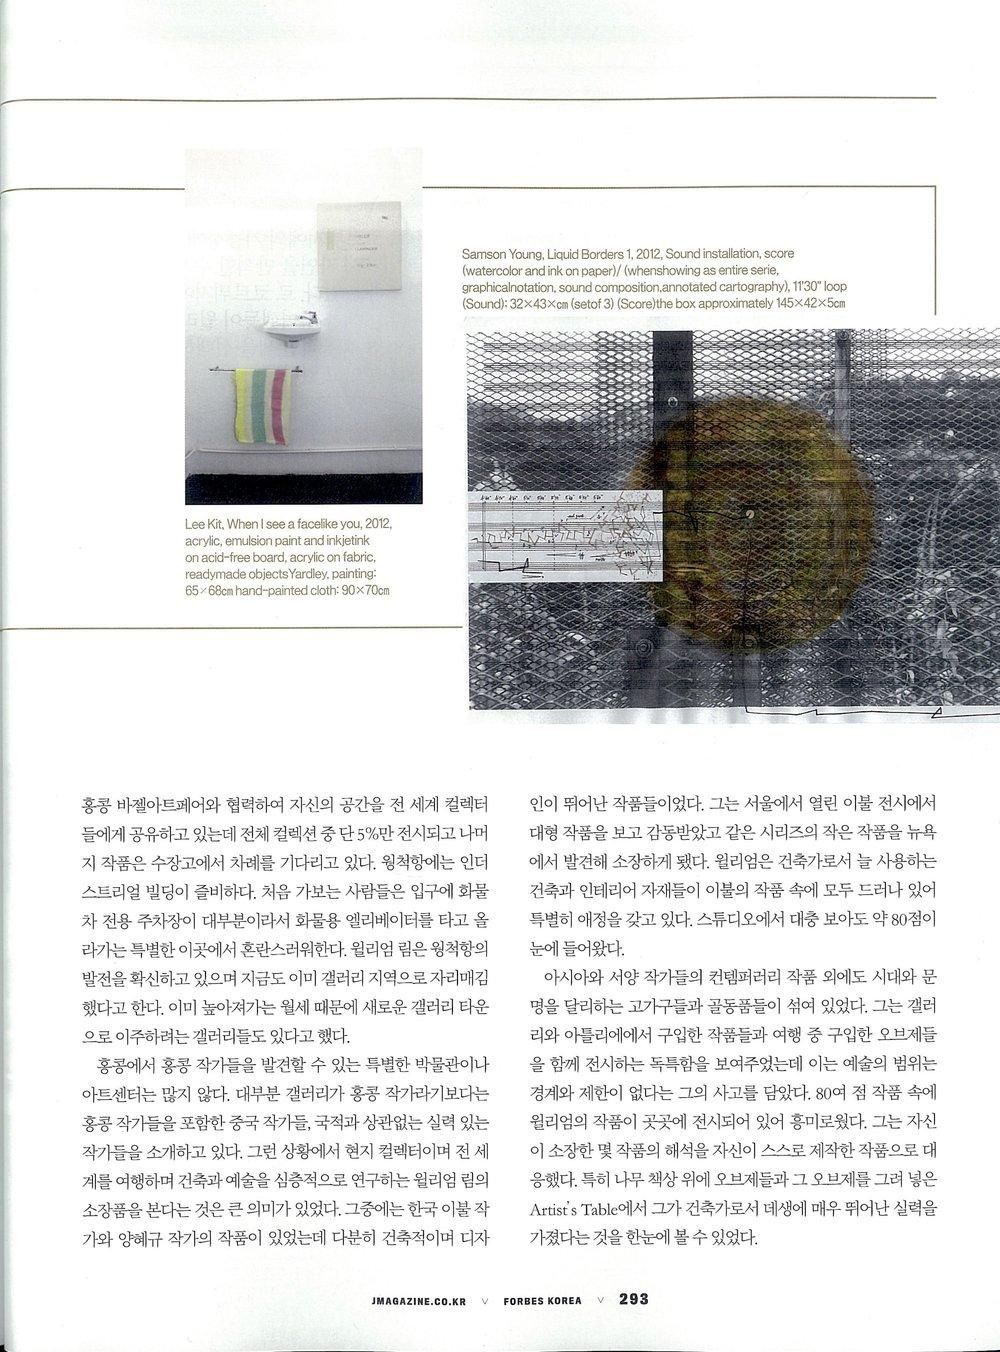 Forbes_Vol 193 MAR 2019_P290-2965.jpg